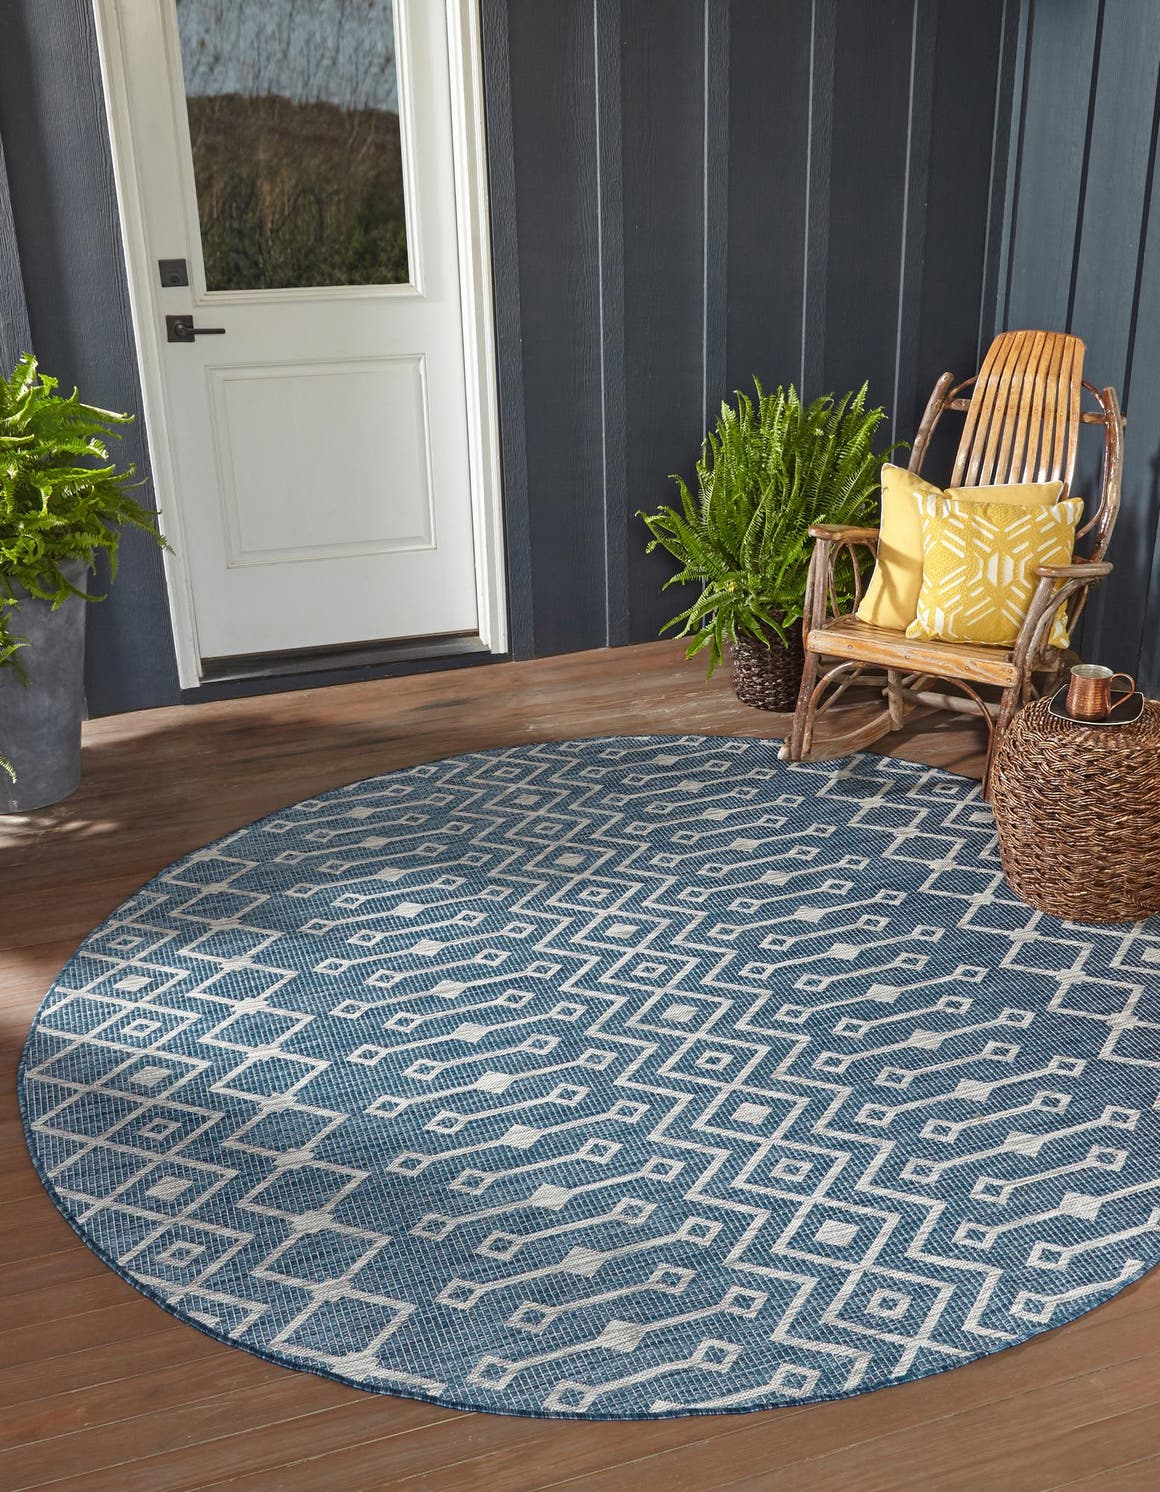 10' x 10' Outdoor Trellis Round Rug main image